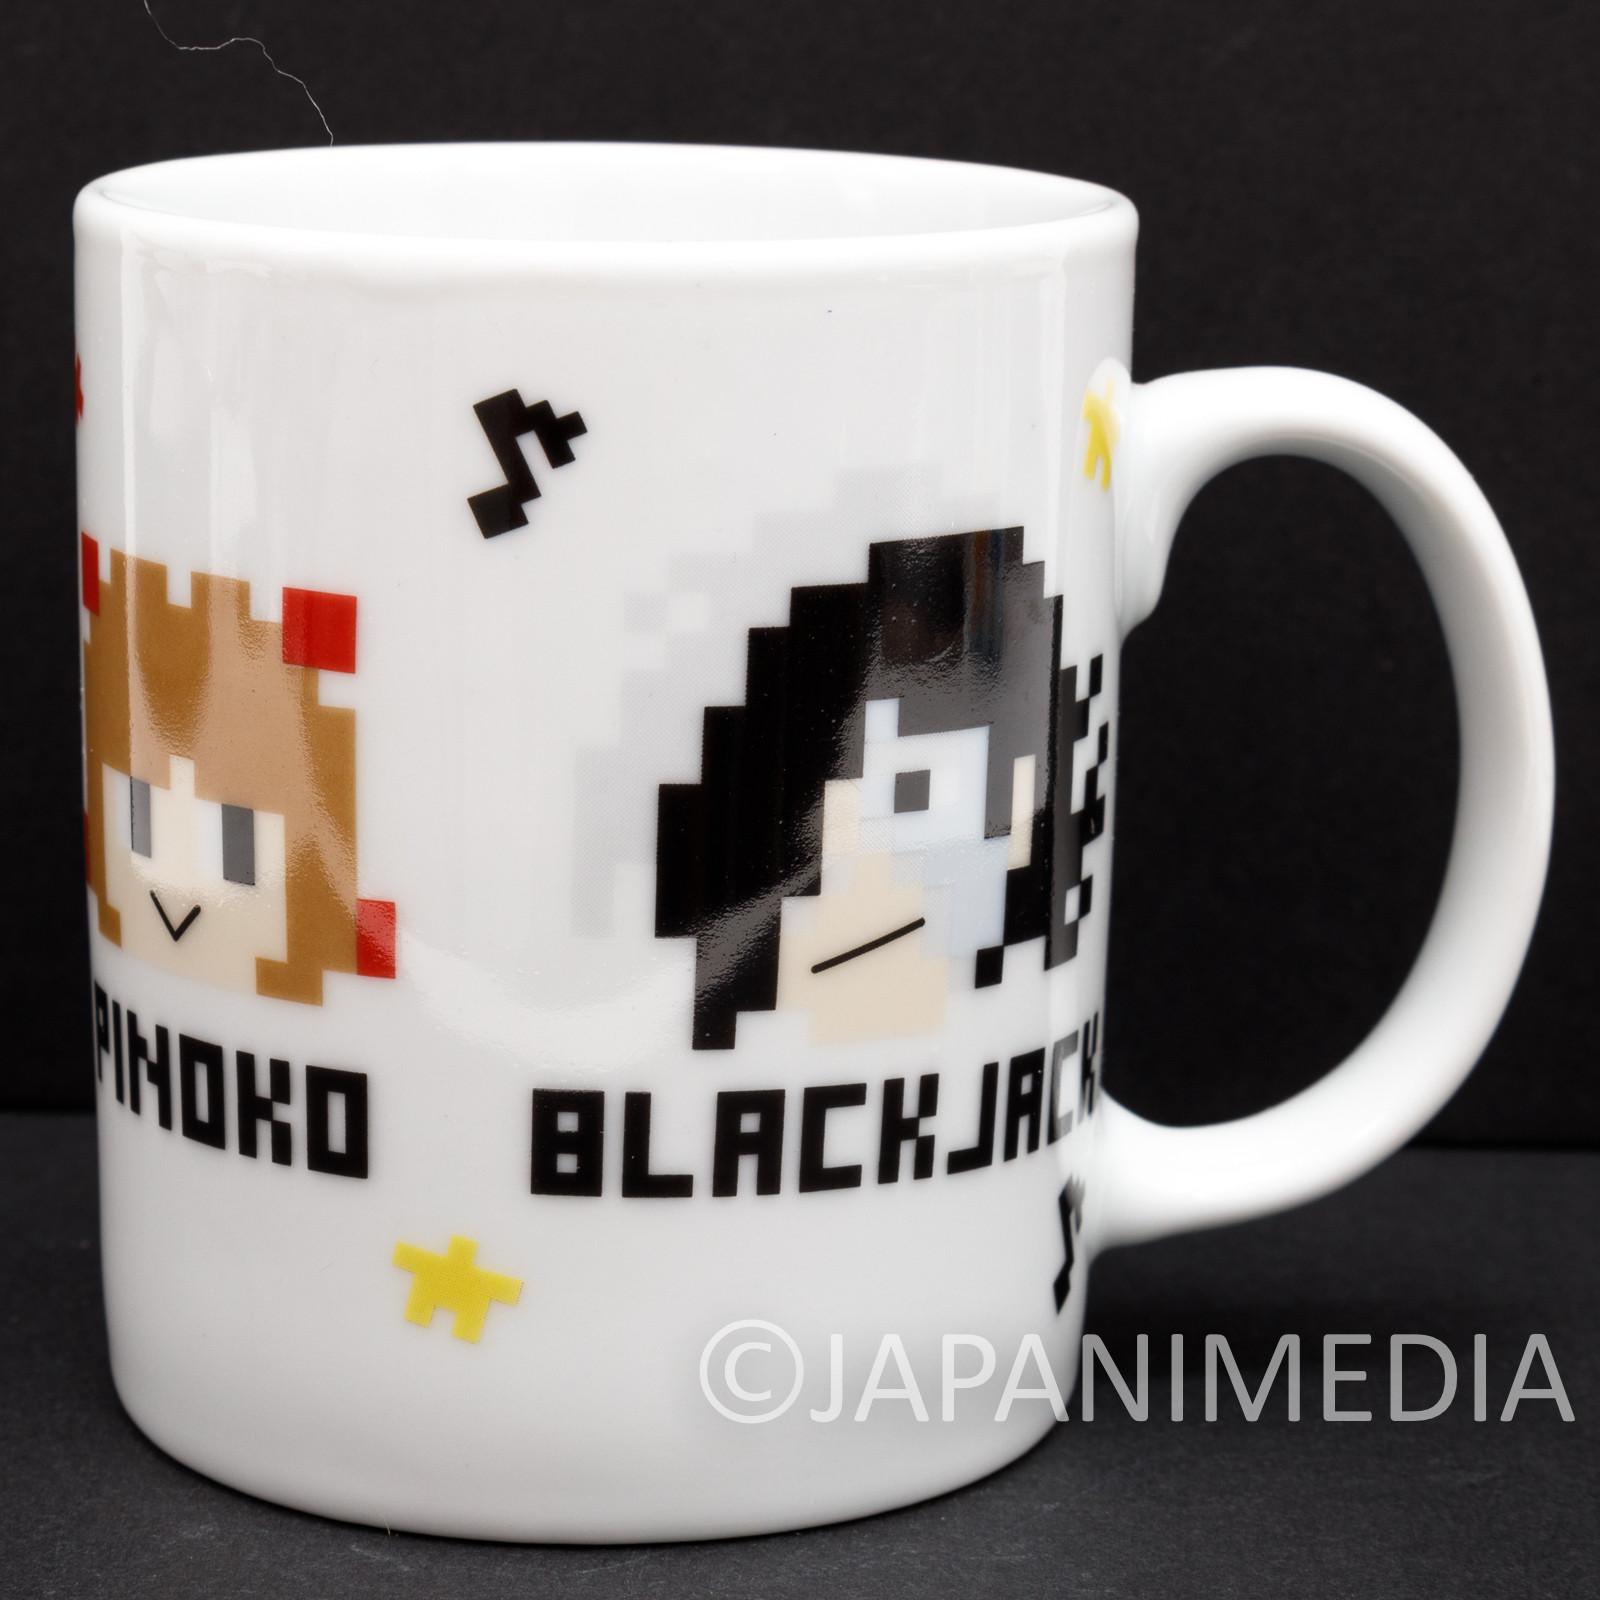 Osamu Tezuka Tokyo Pixel Mug #1 Black Jack Pinoko Astro Boy Atom Uran JAPAN